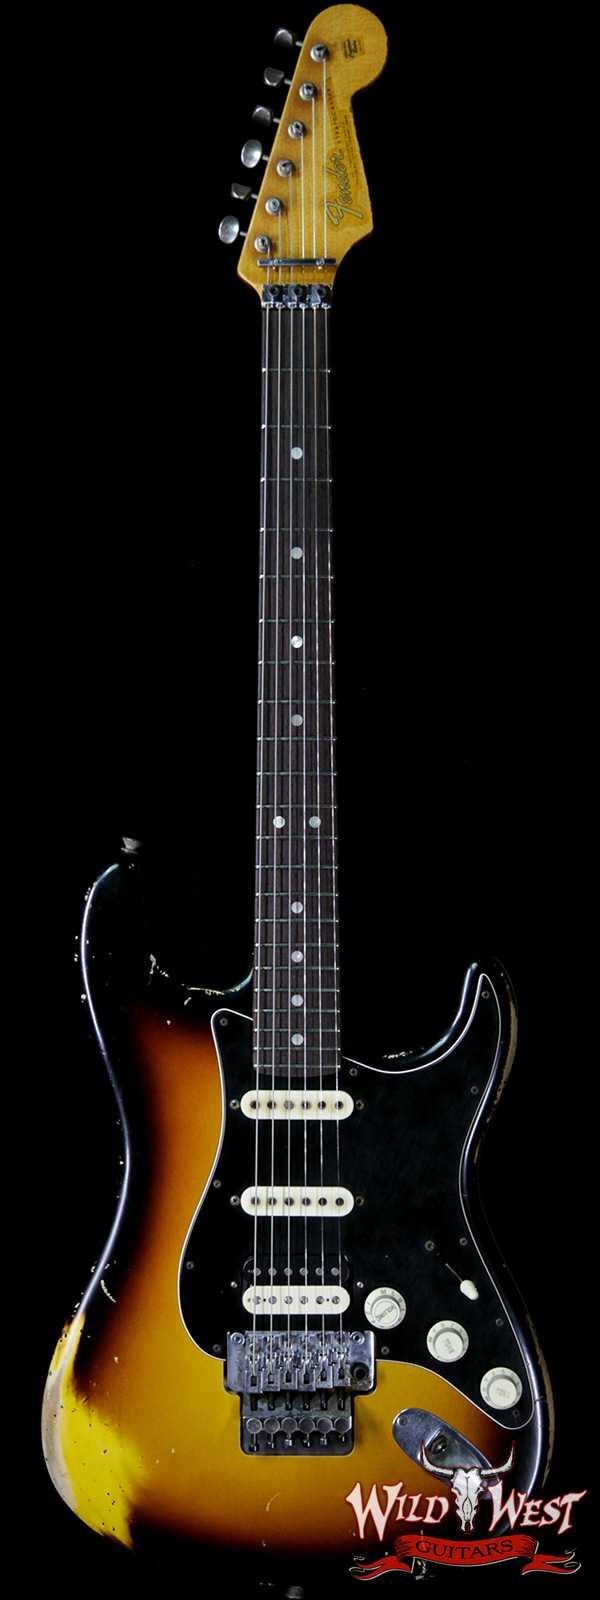 Fender Custom Shop John Cruz Masterbuilt 1965 Stratocaster HSS Floyd Rose Relic 3 Tone Sunburst